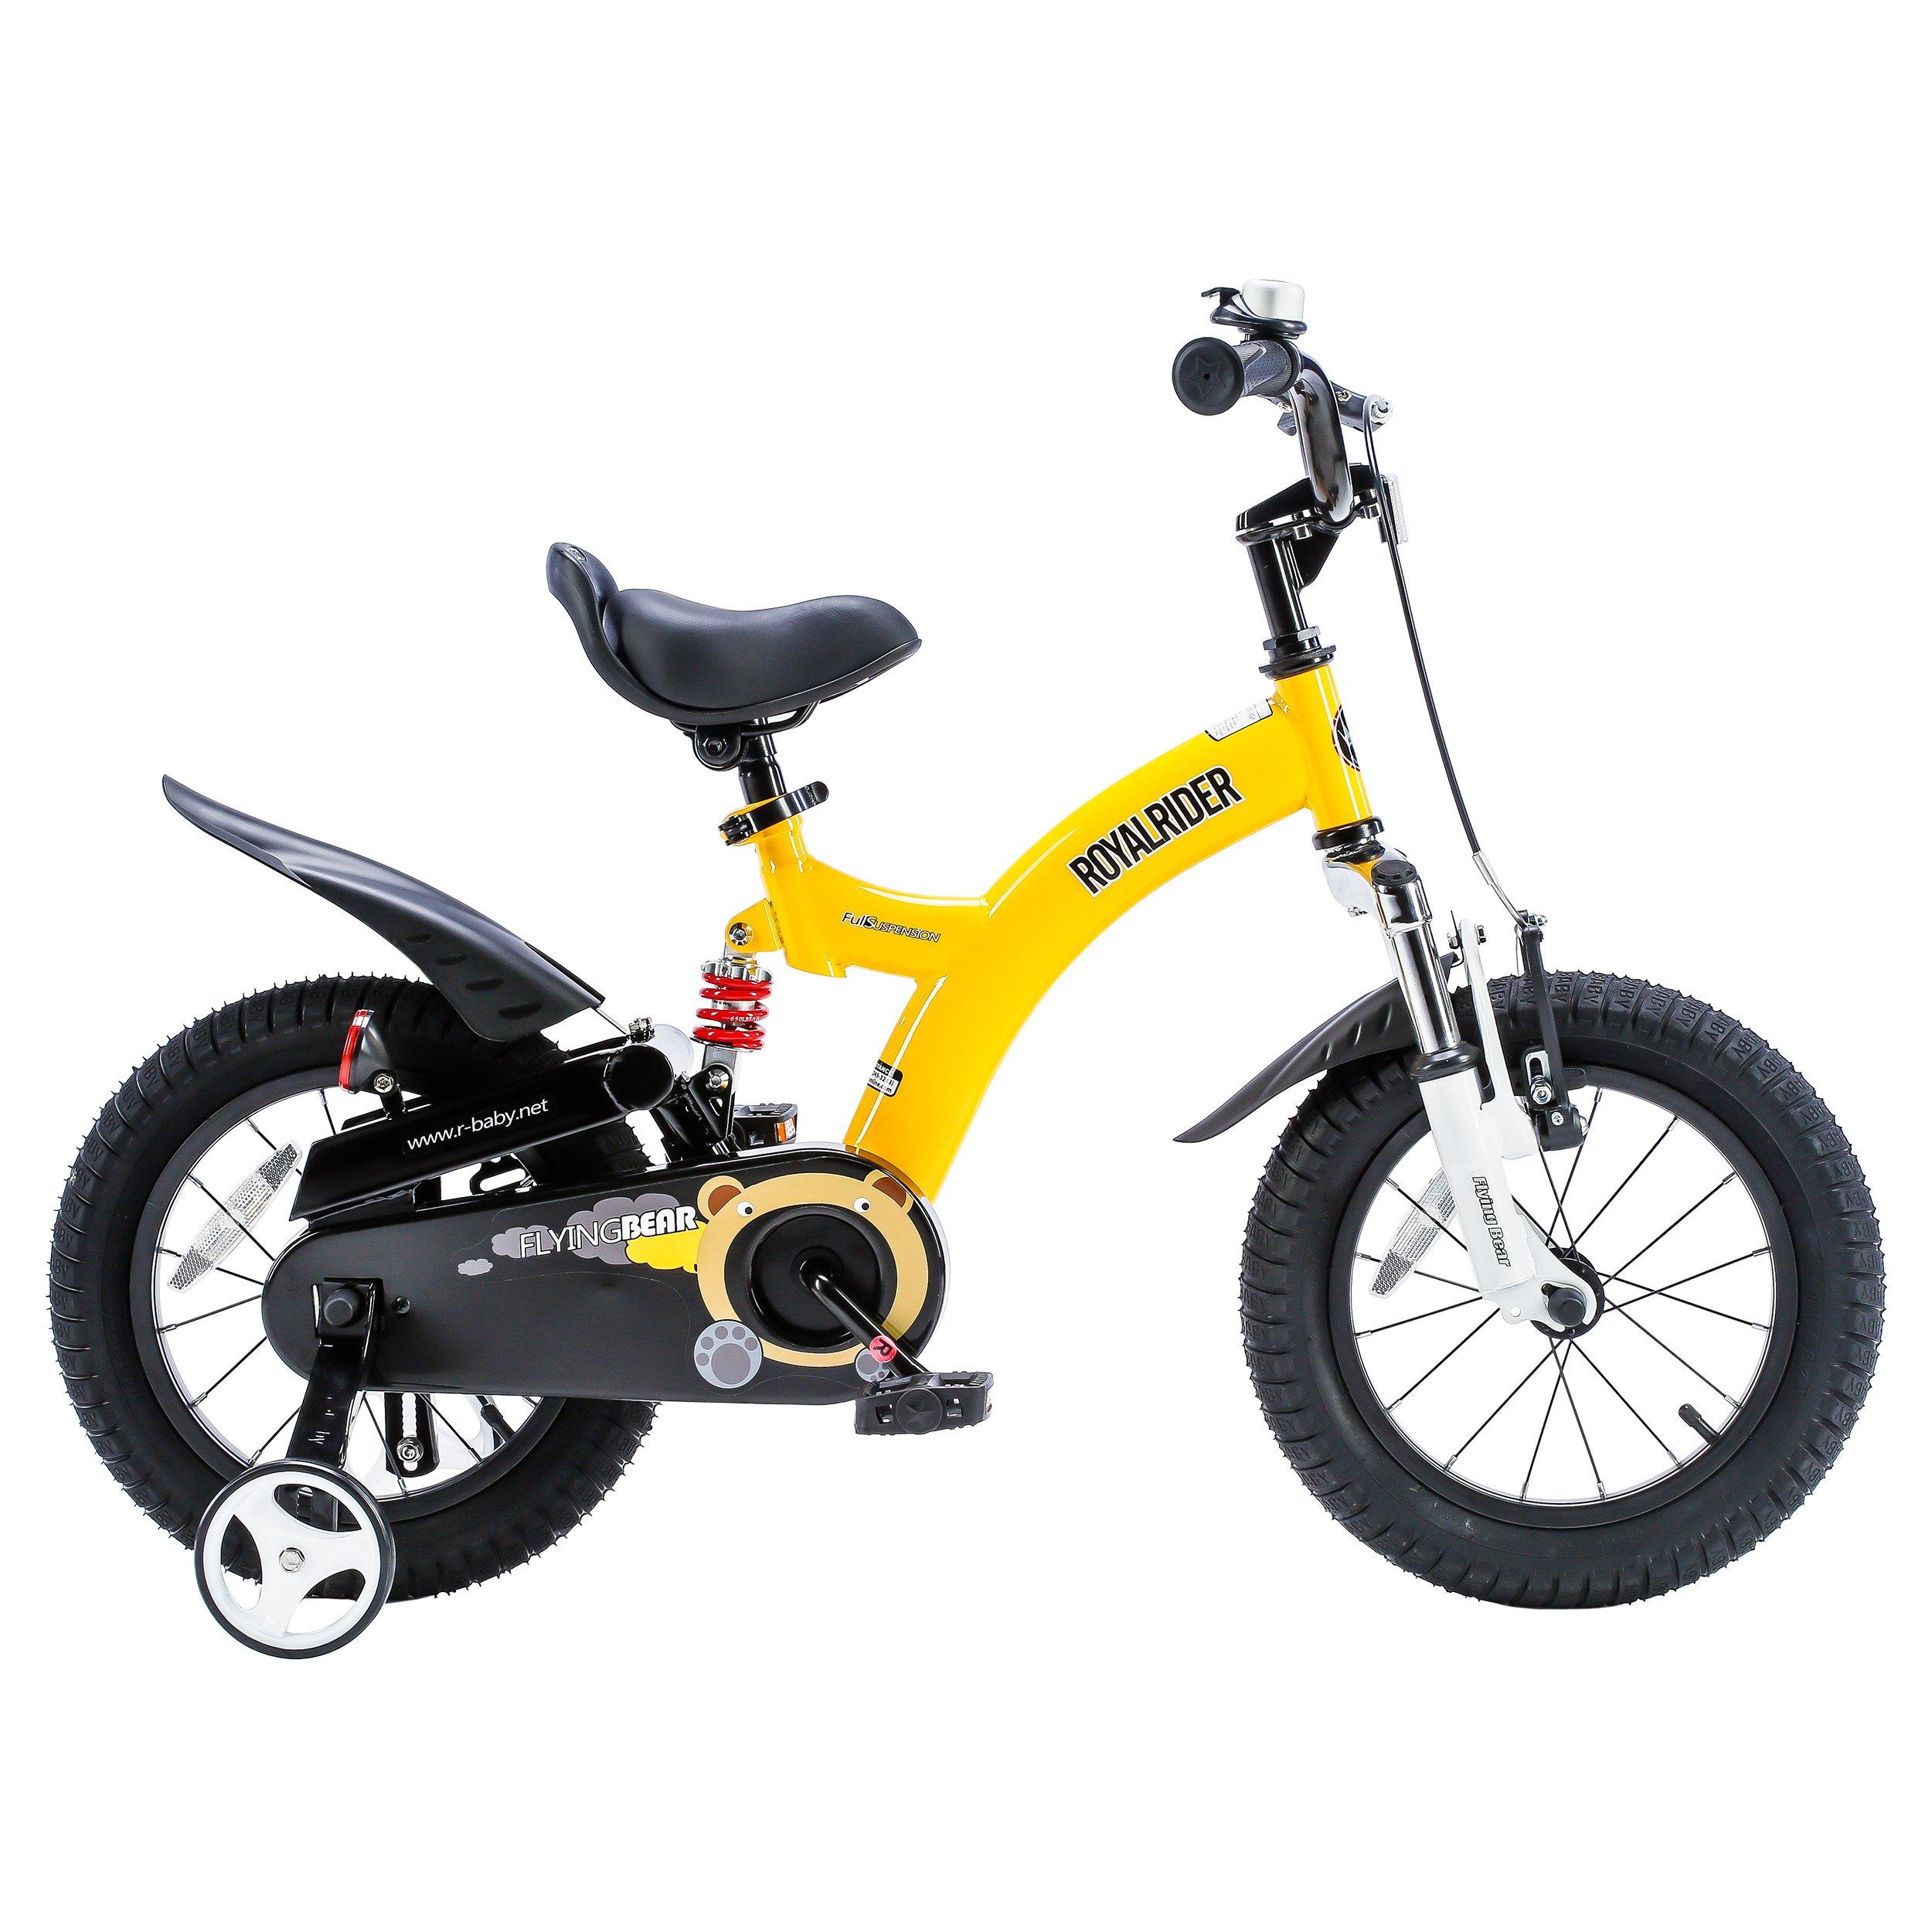 Royalbaby Flying Bear Full Suspension Kids Bike Perfect Gift for Kids, Boys Bike, Girls Bike, Sport Bike, 12 Inch Wheels, Yellow